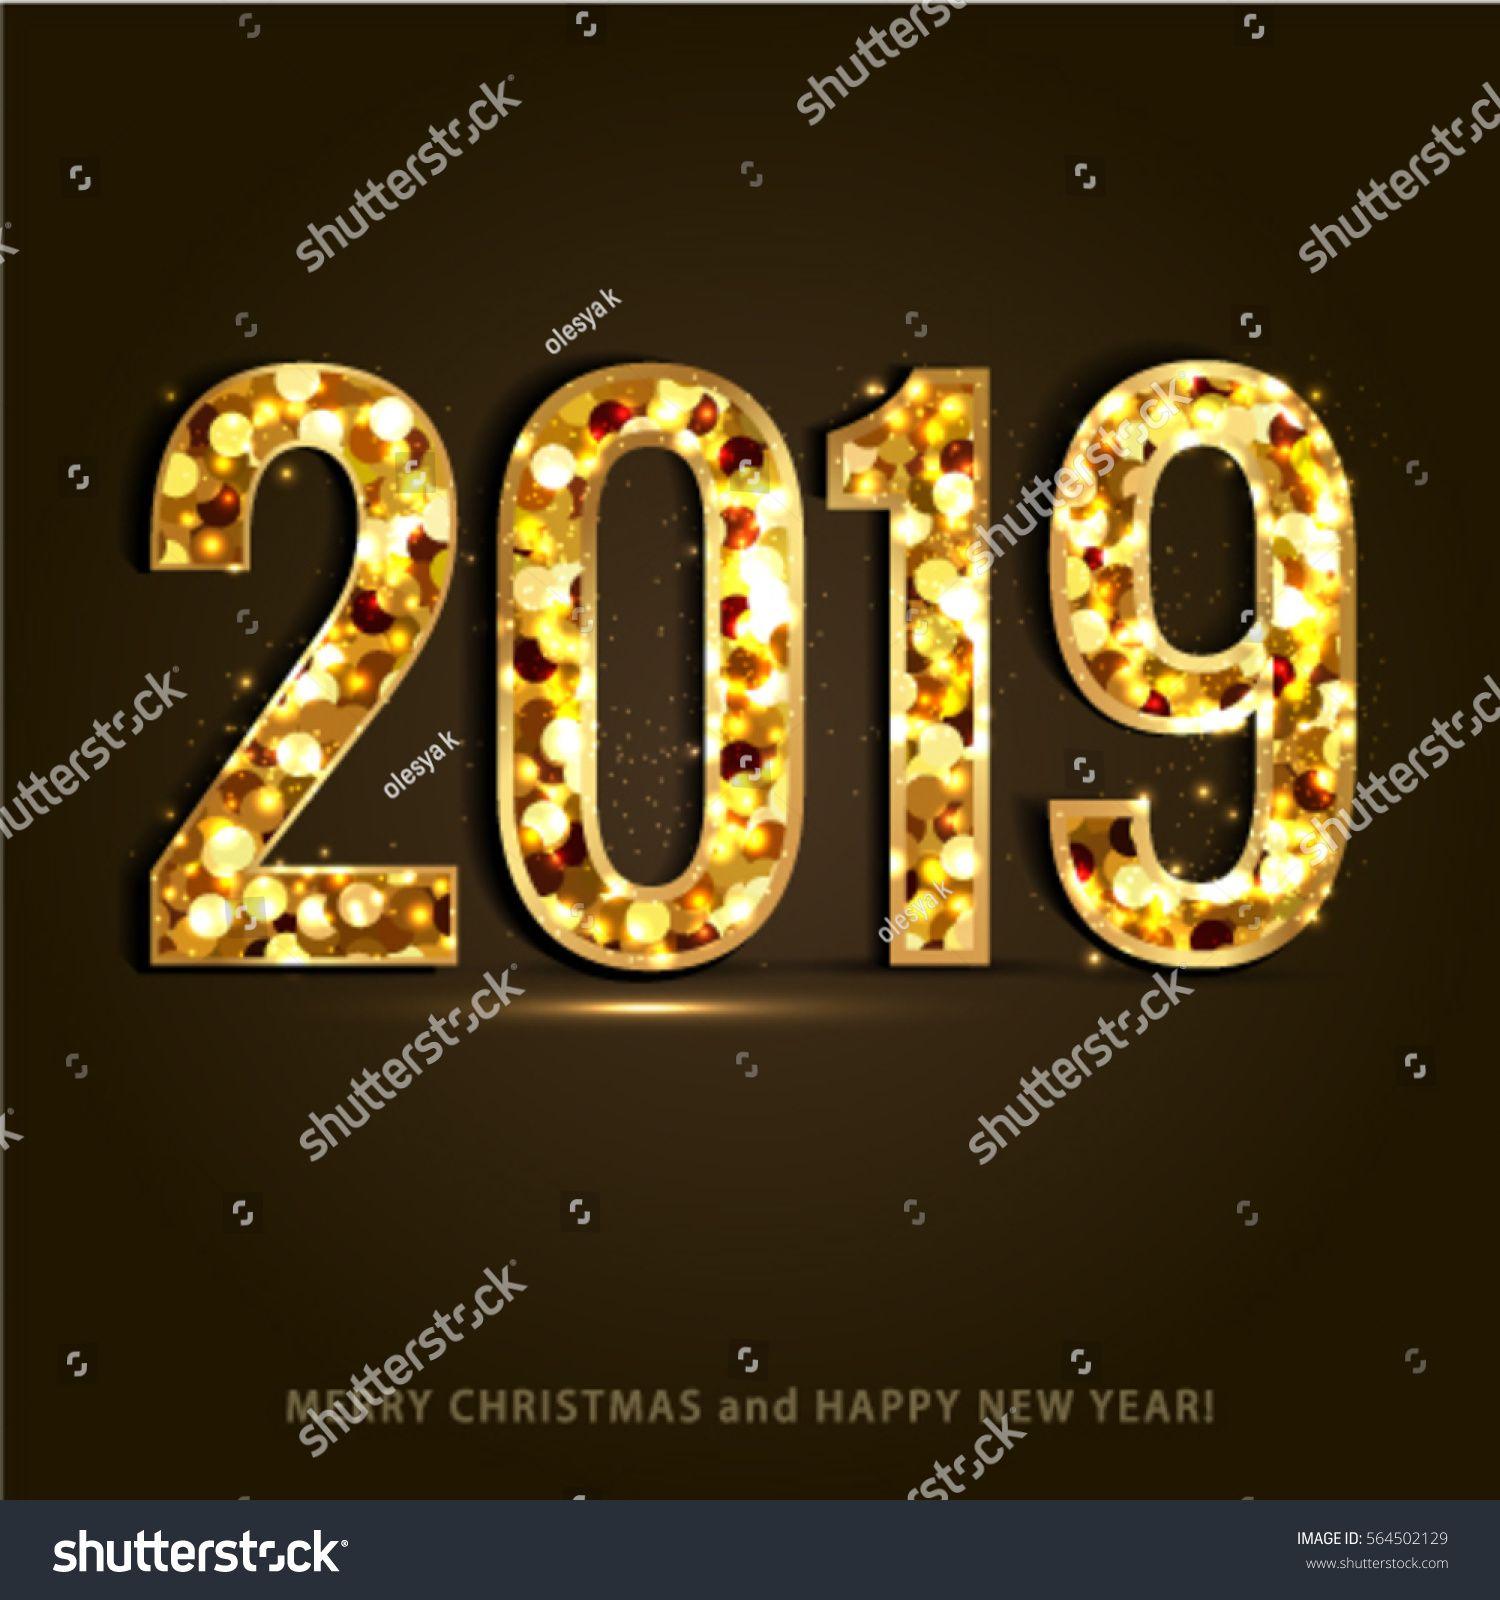 Happy Christmas 2019   Bastelideen   Pinterest   Christmas 2019 ...